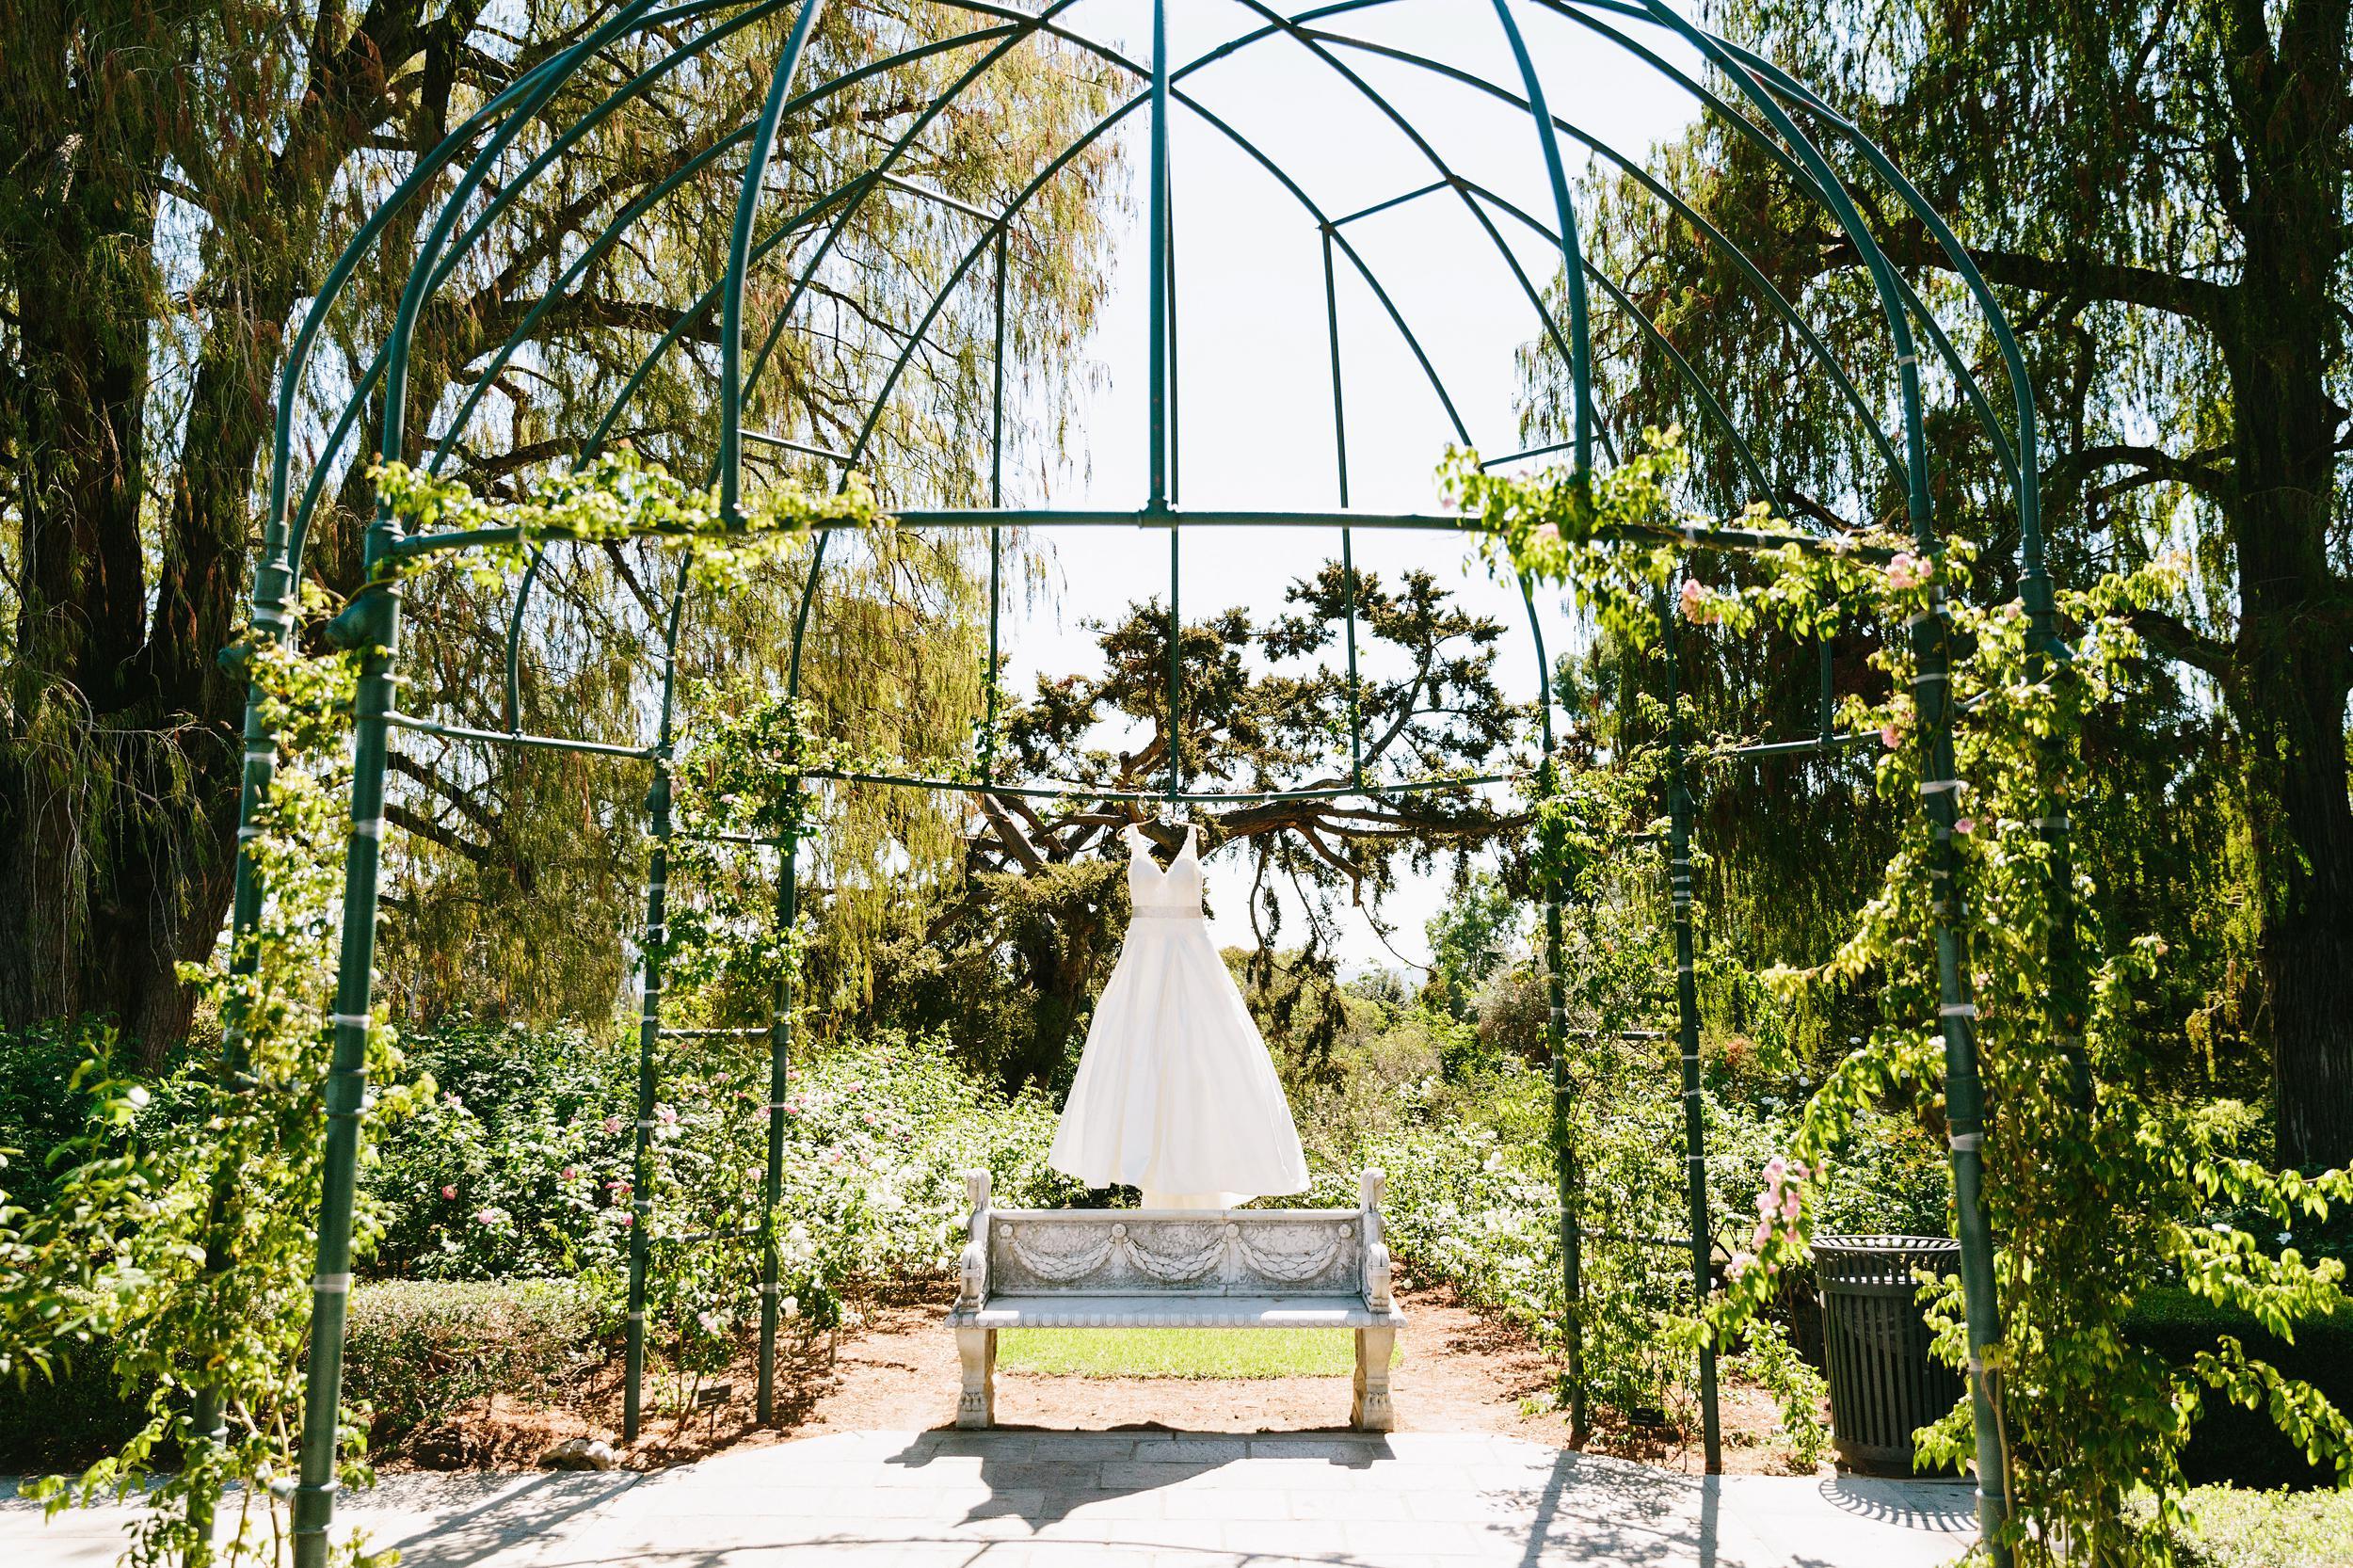 huntington-library-wedding-HP-03.jpg